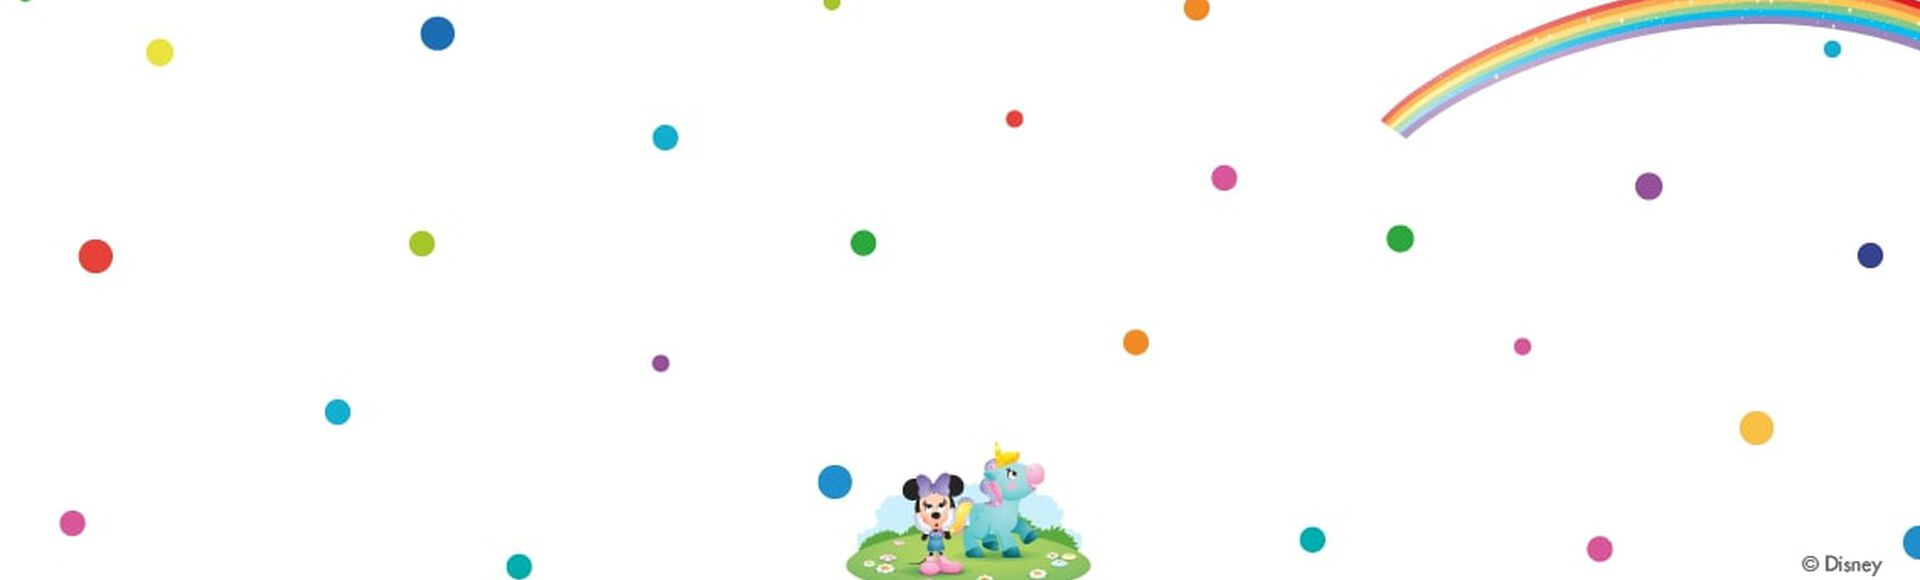 Minnie Mouse e Lily o unicórnio